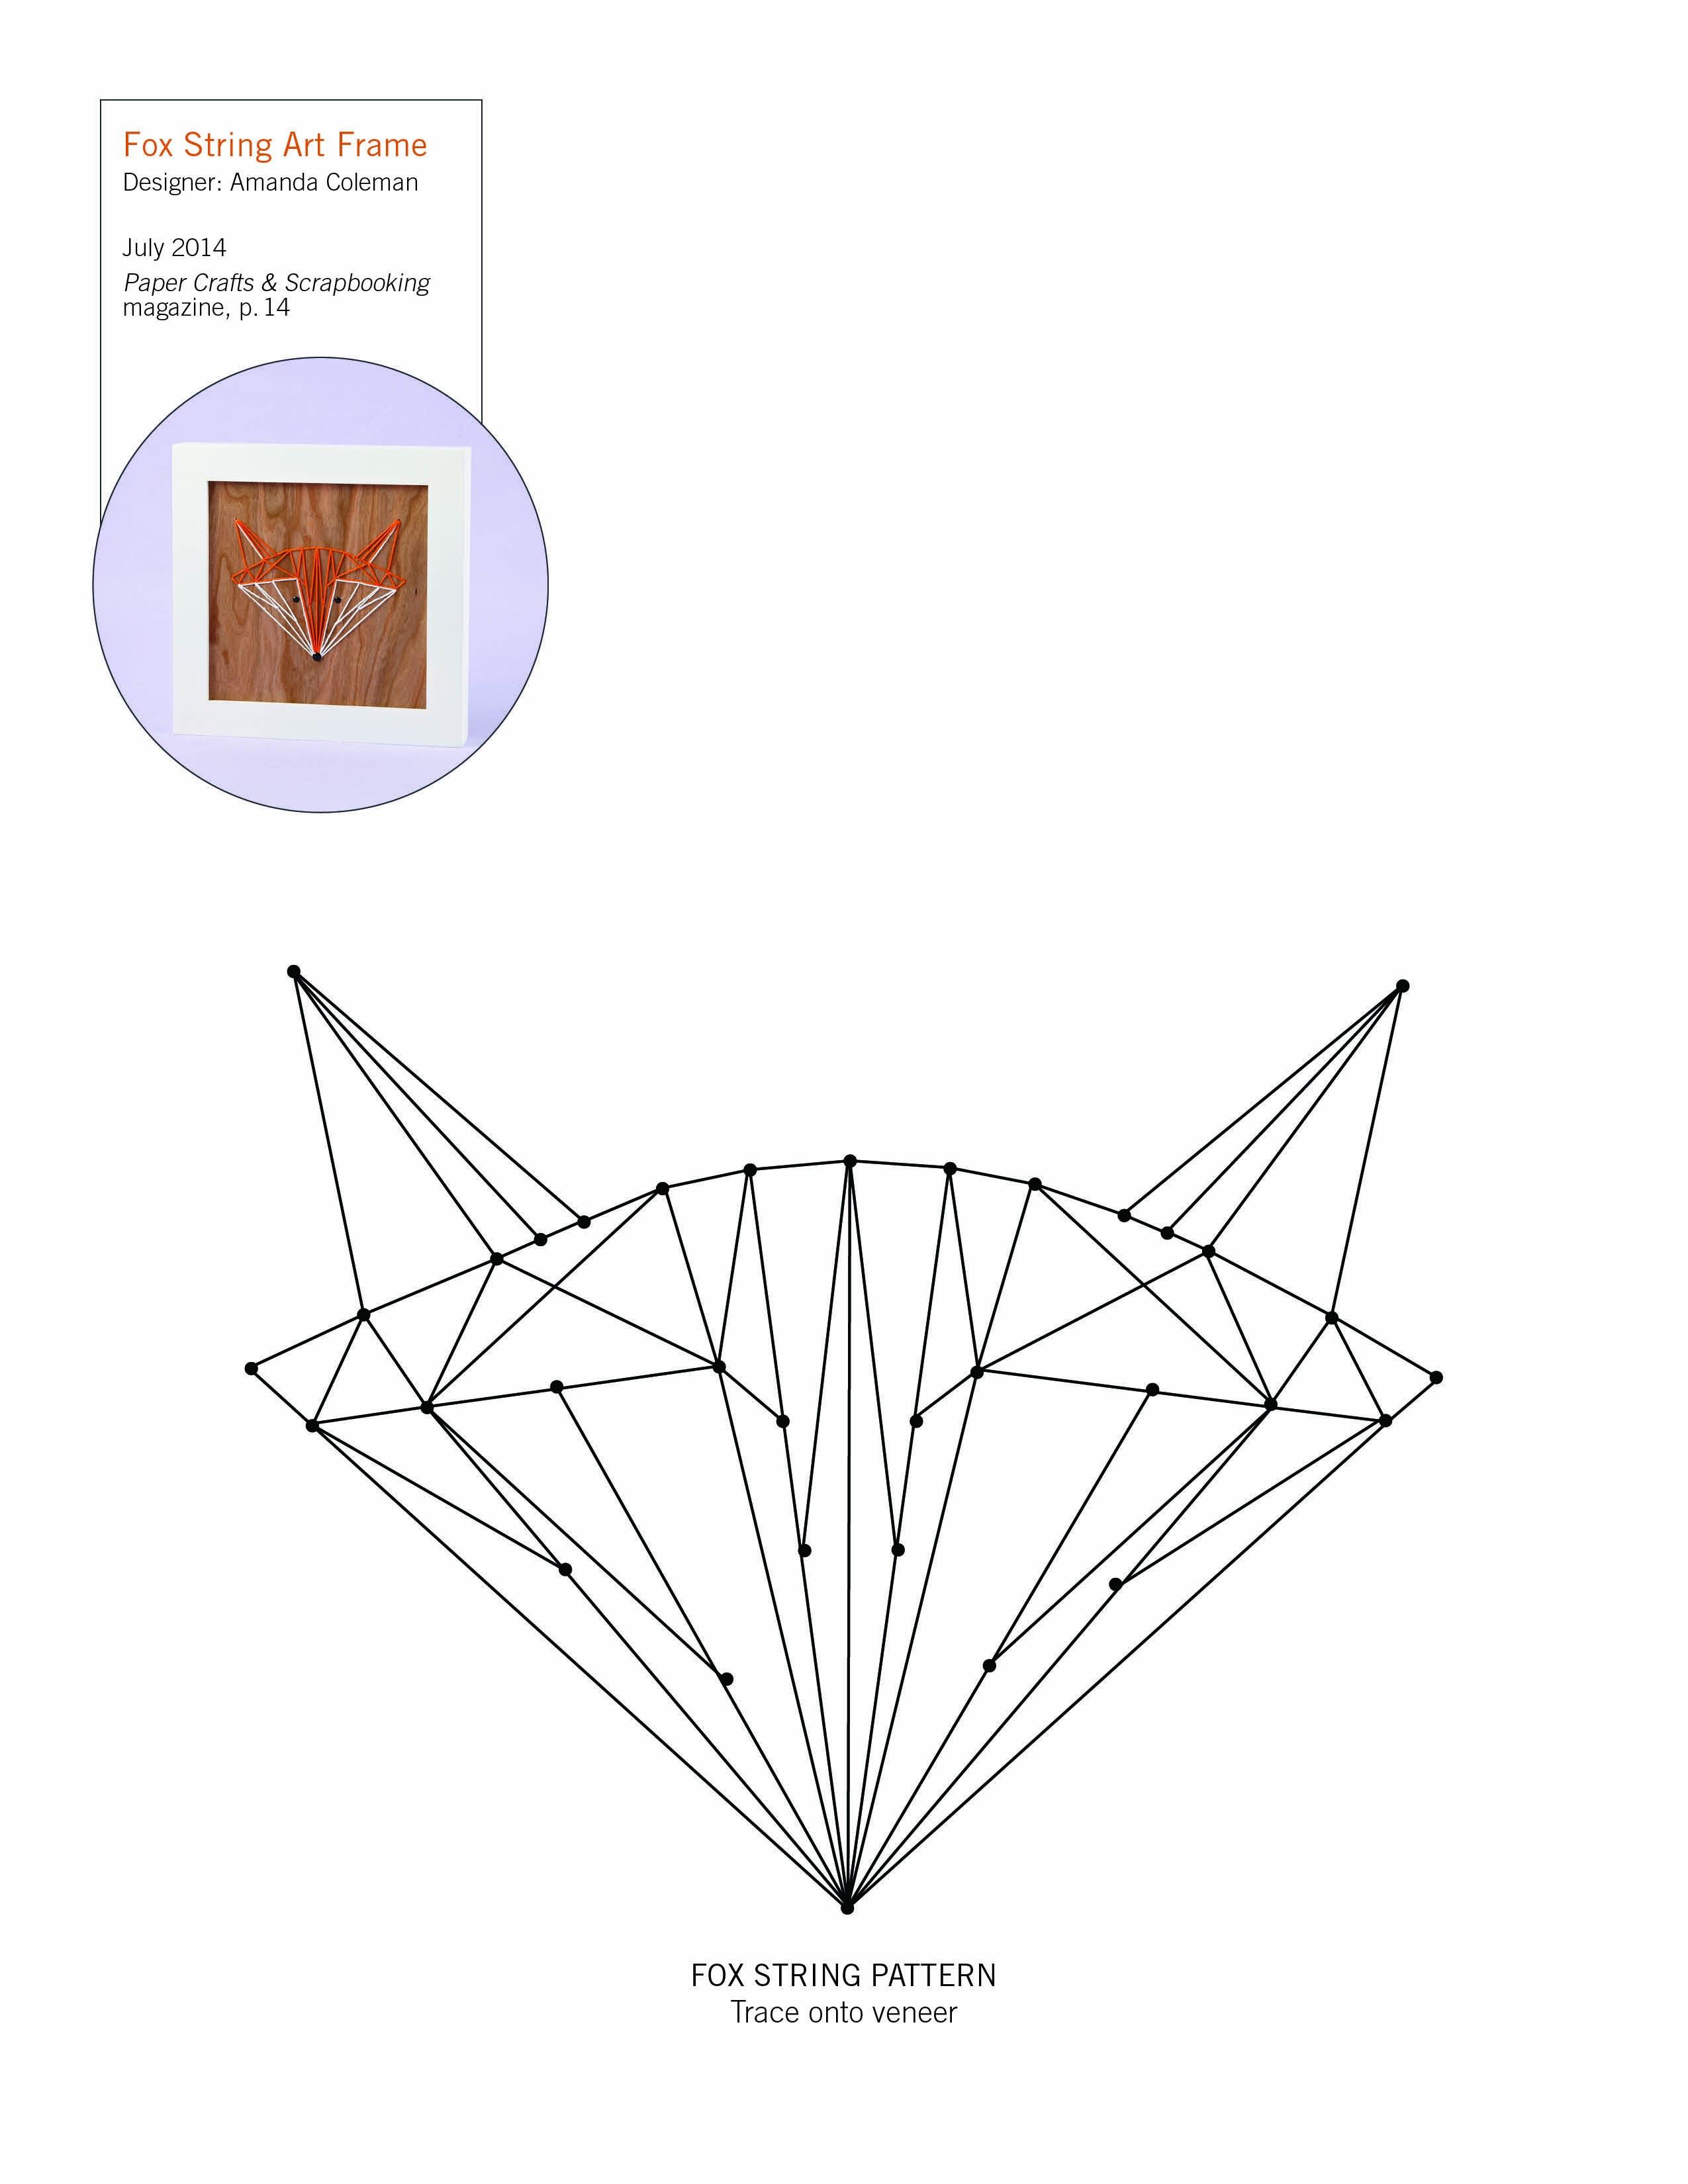 Image Result For Free Printable String Art Patterns   Diy   String - Free Printable String Art Patterns